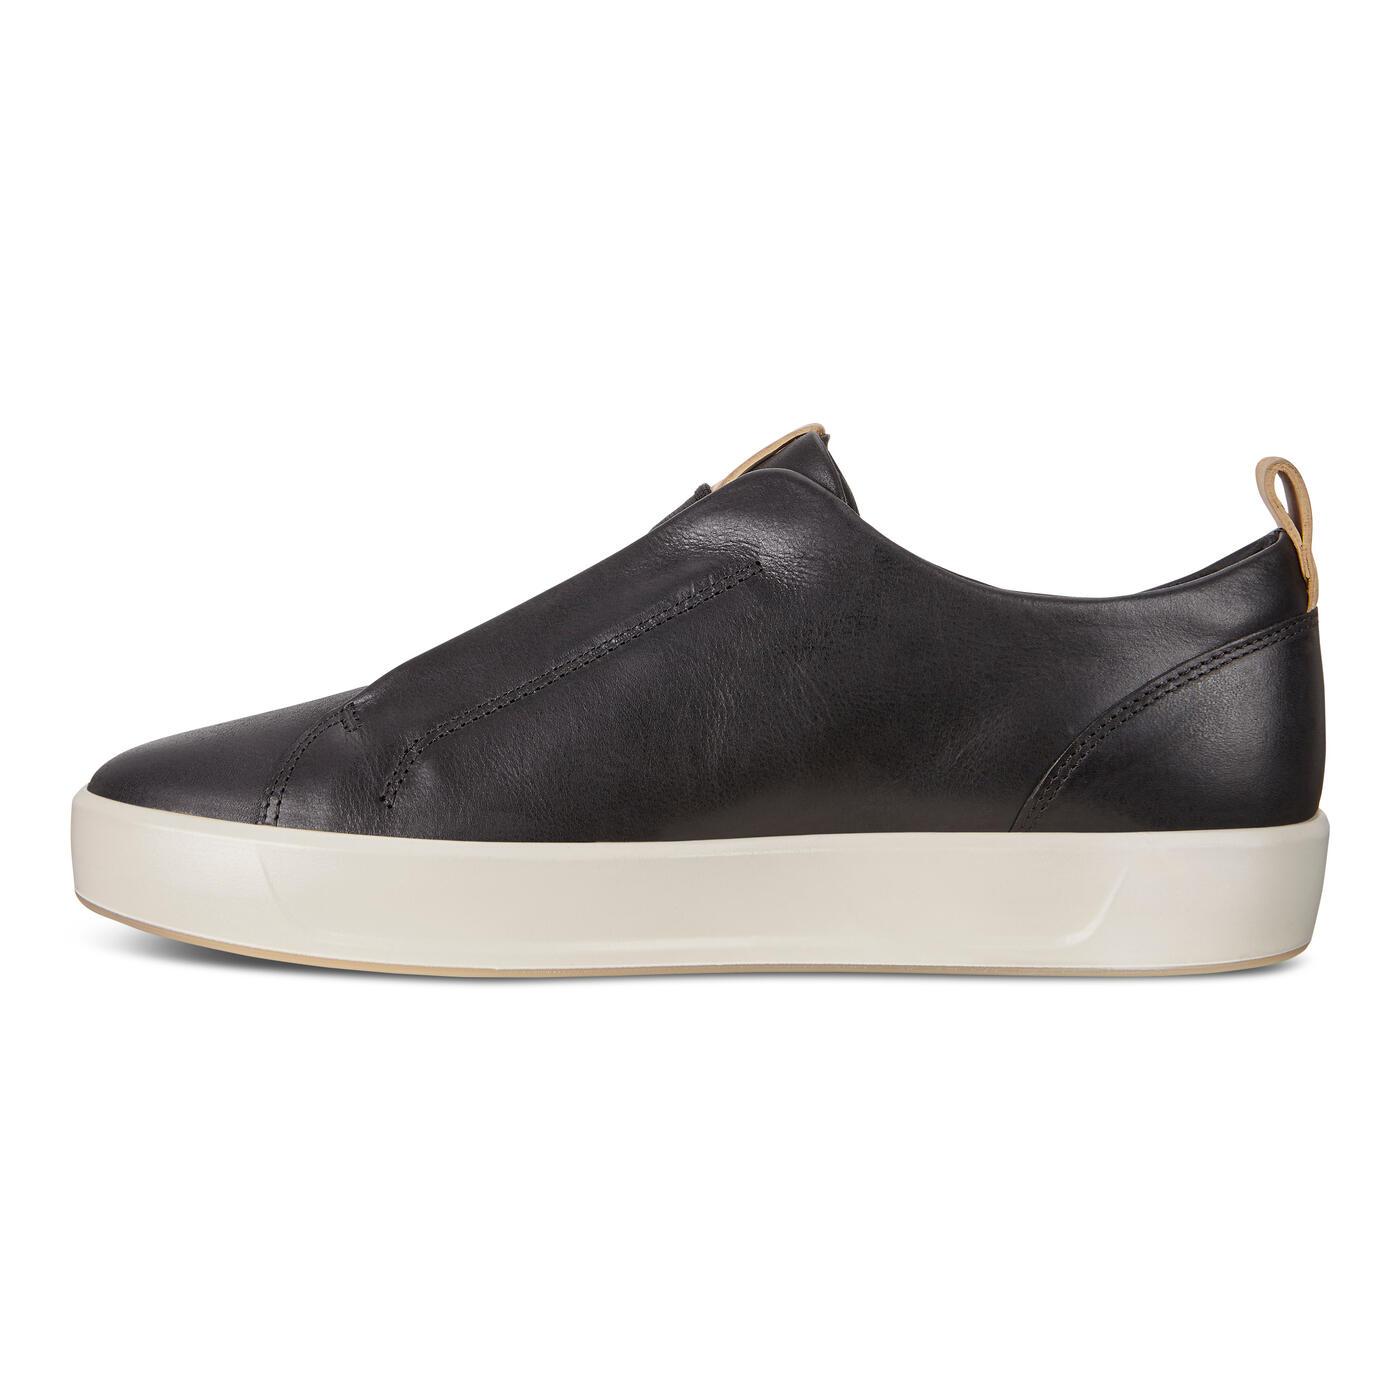 ECCO SOFT8 LX Mens Sneaker Slip-on